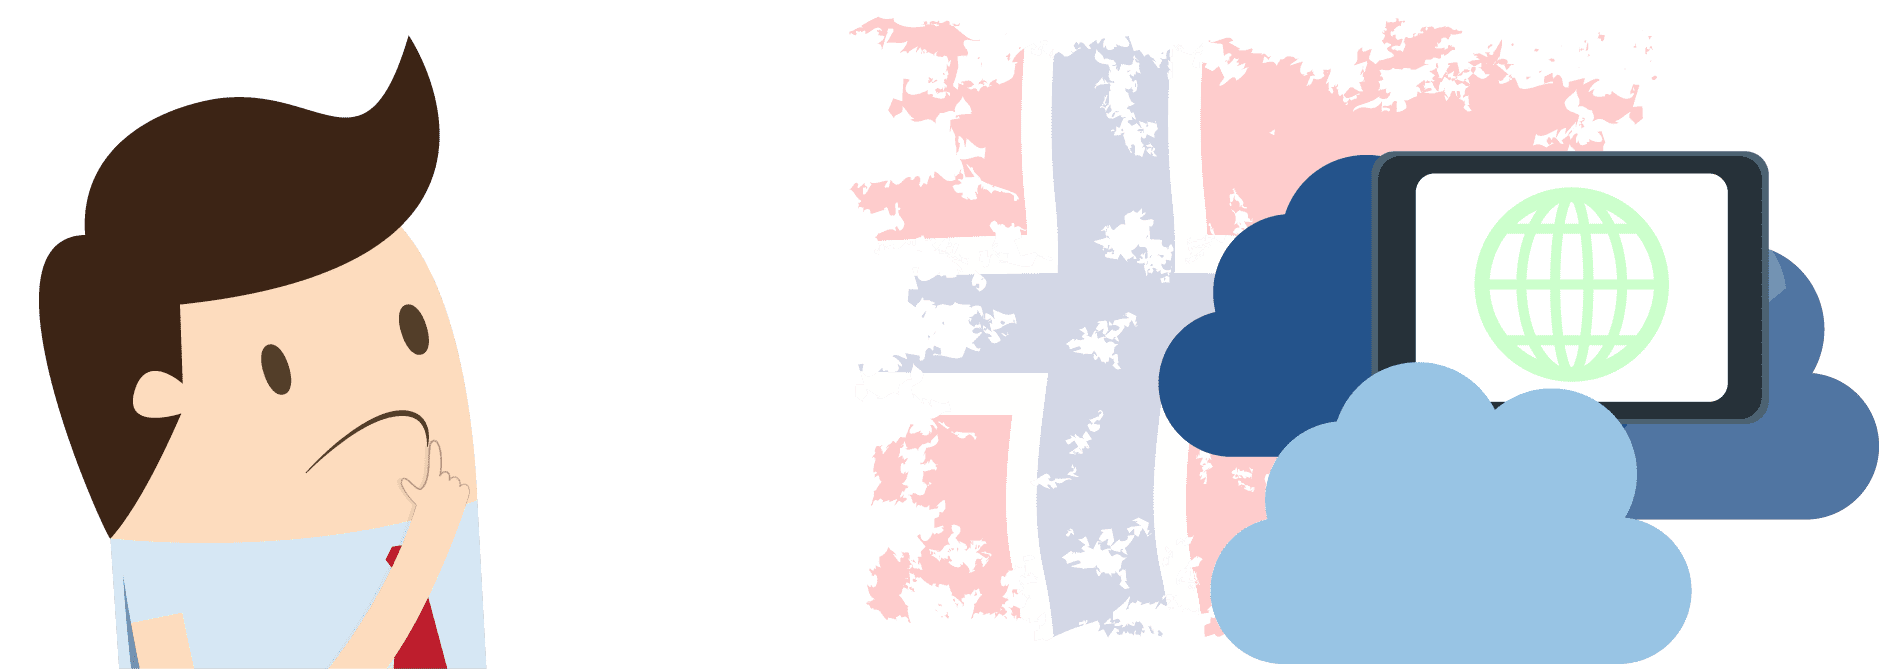 English to Norwegian translators